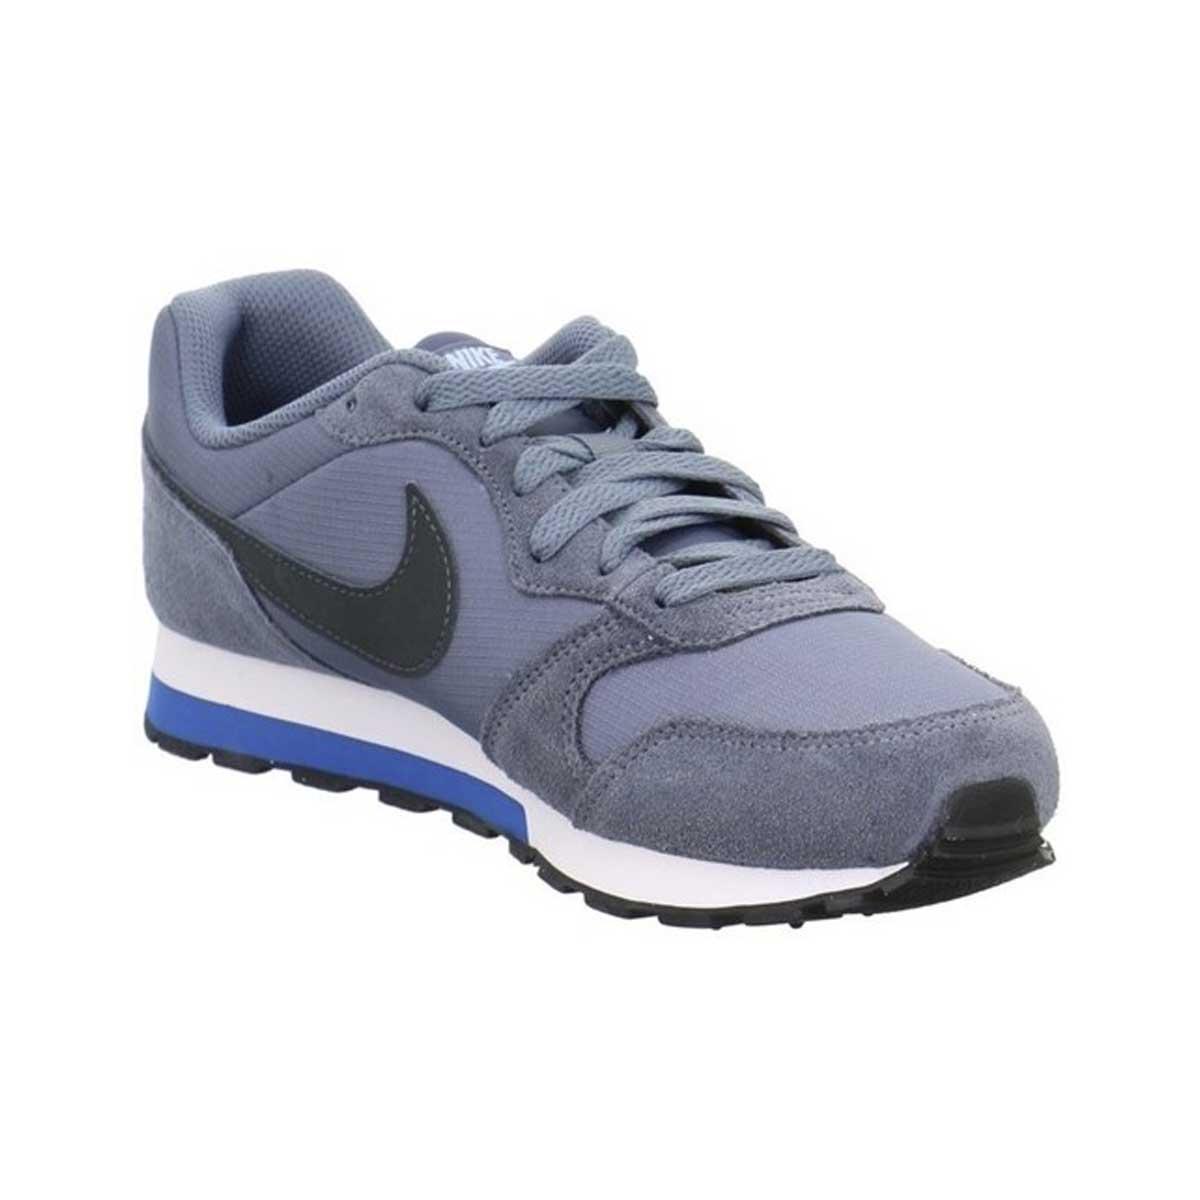 finest selection 480fa 1f83d Nike Scarpe Bimbo Grigio